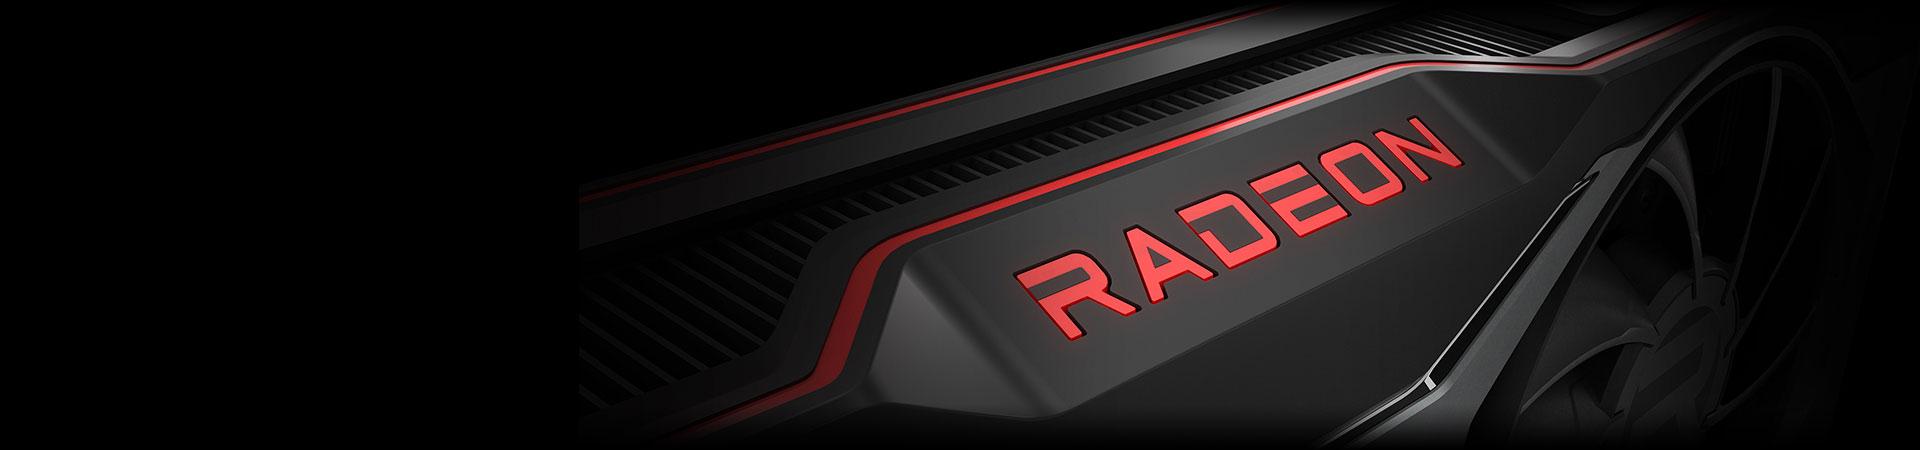 Radeon RX 6700 XT 12G